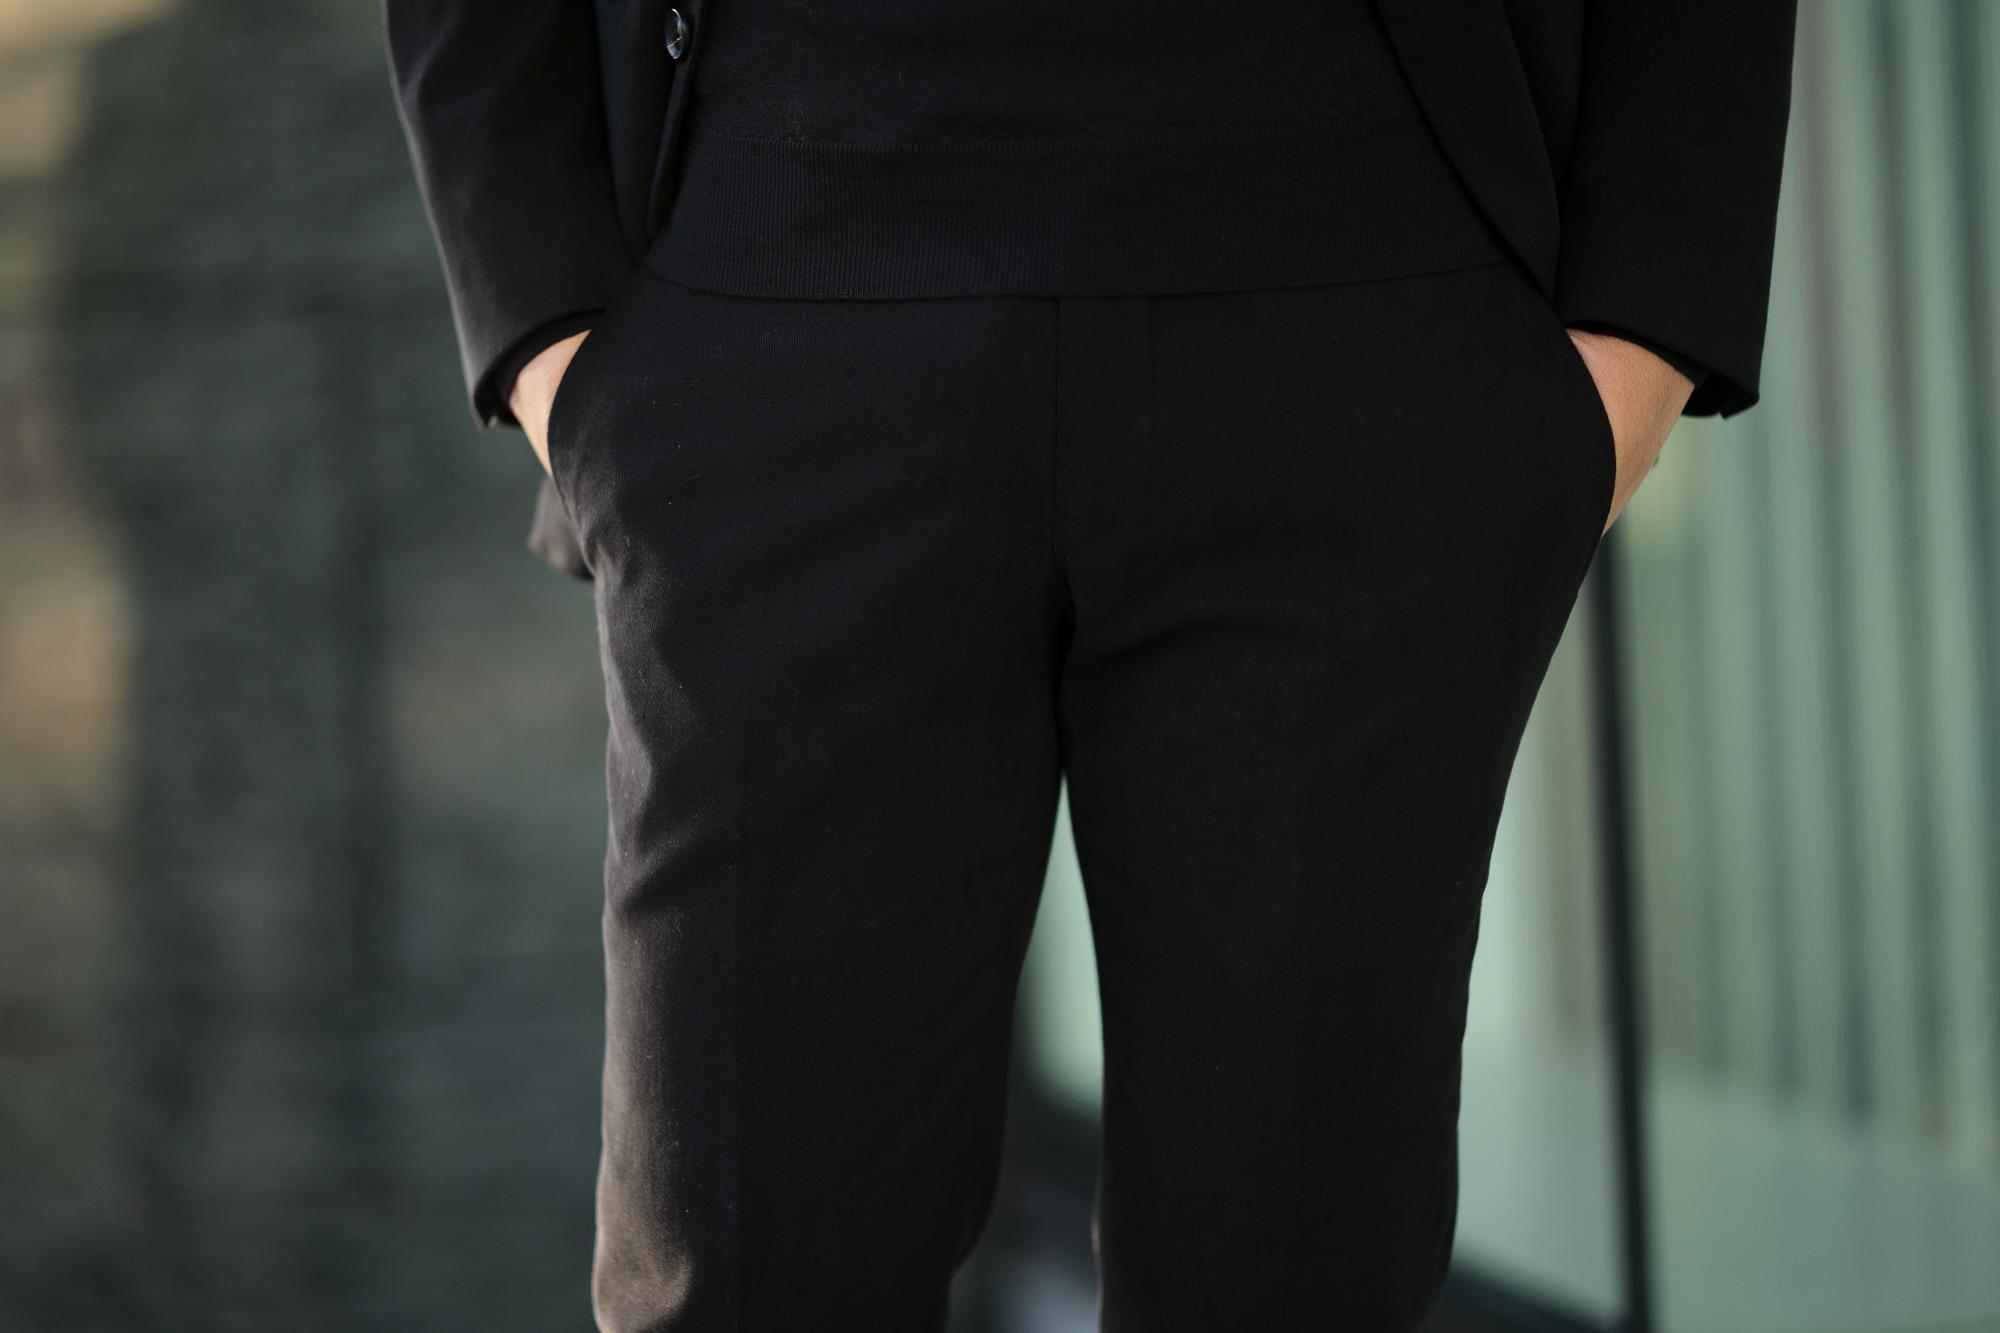 Cuervo (クエルボ) Sartoria Collection (サルトリア コレクション) Rooster (ルースター) STRETCH COTTON ストレッチコットン スーツ BLACK (ブラック) MADE IN JAPAN (日本製) 2019 春夏新作 【第1便ご予約受付中】alto e diritto アルトエデリット